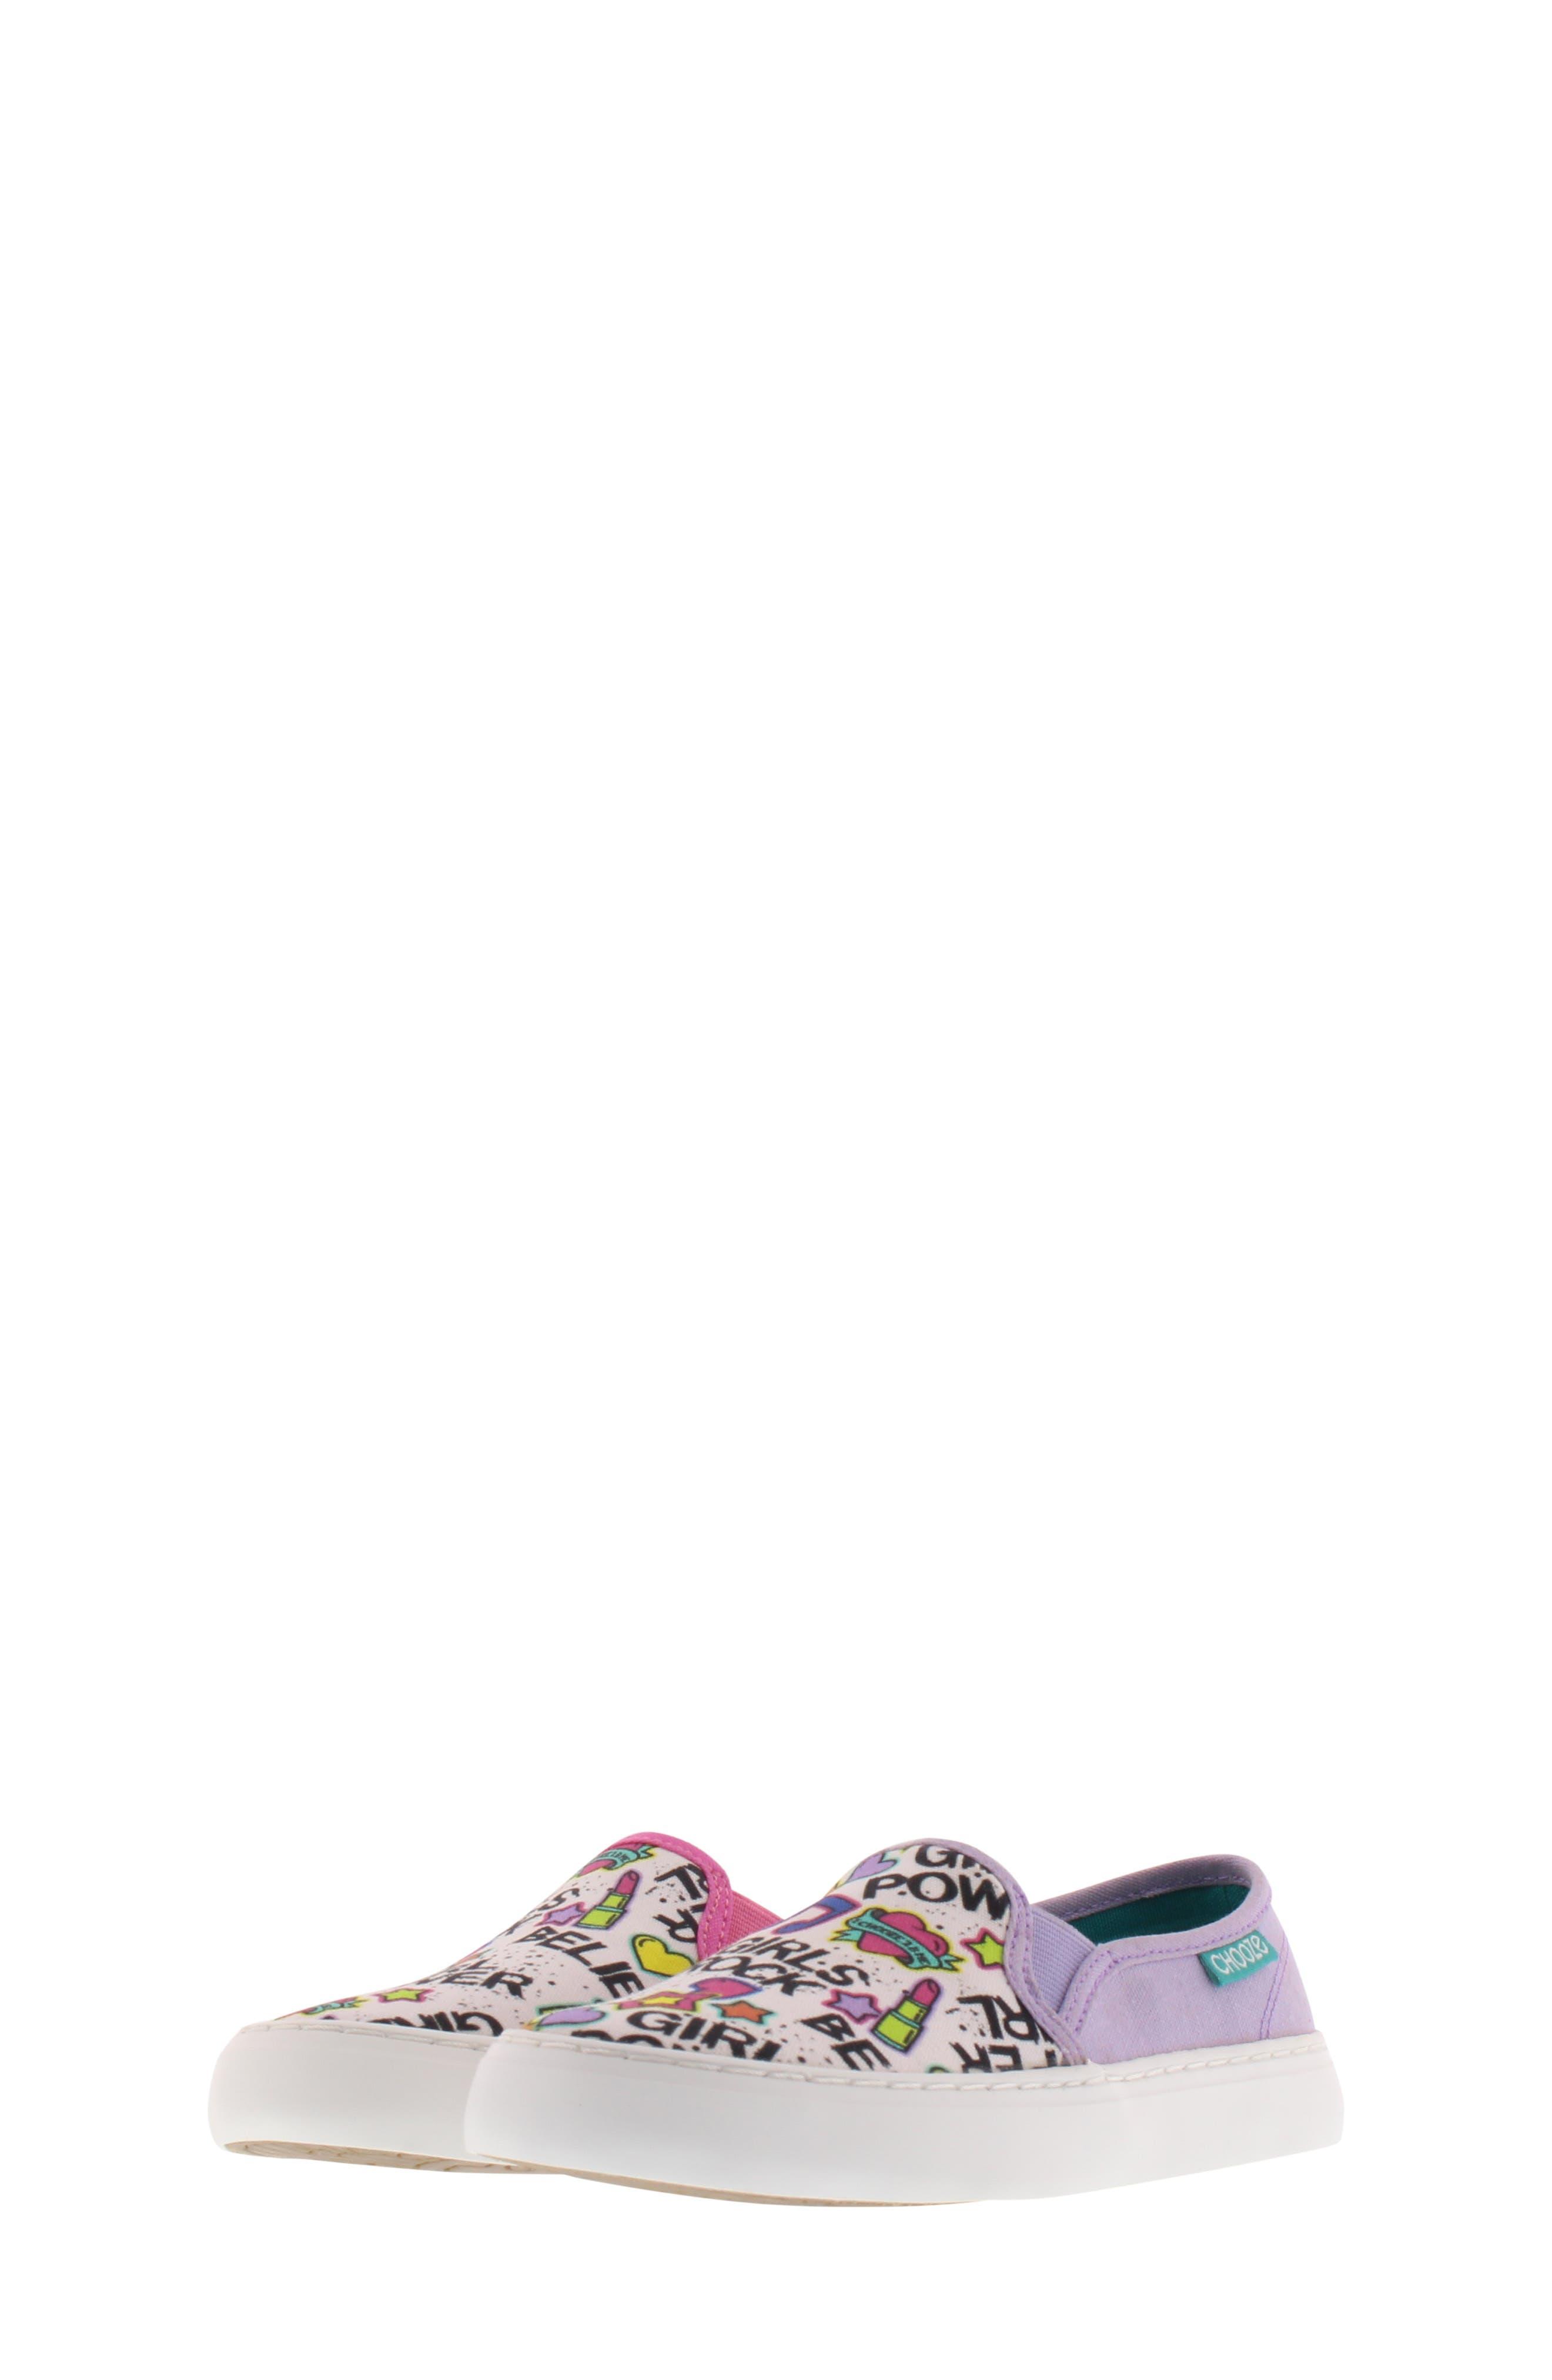 CHOOZE, Move Motion Slip-On Sneaker, Alternate thumbnail 8, color, PINK LAVENDER